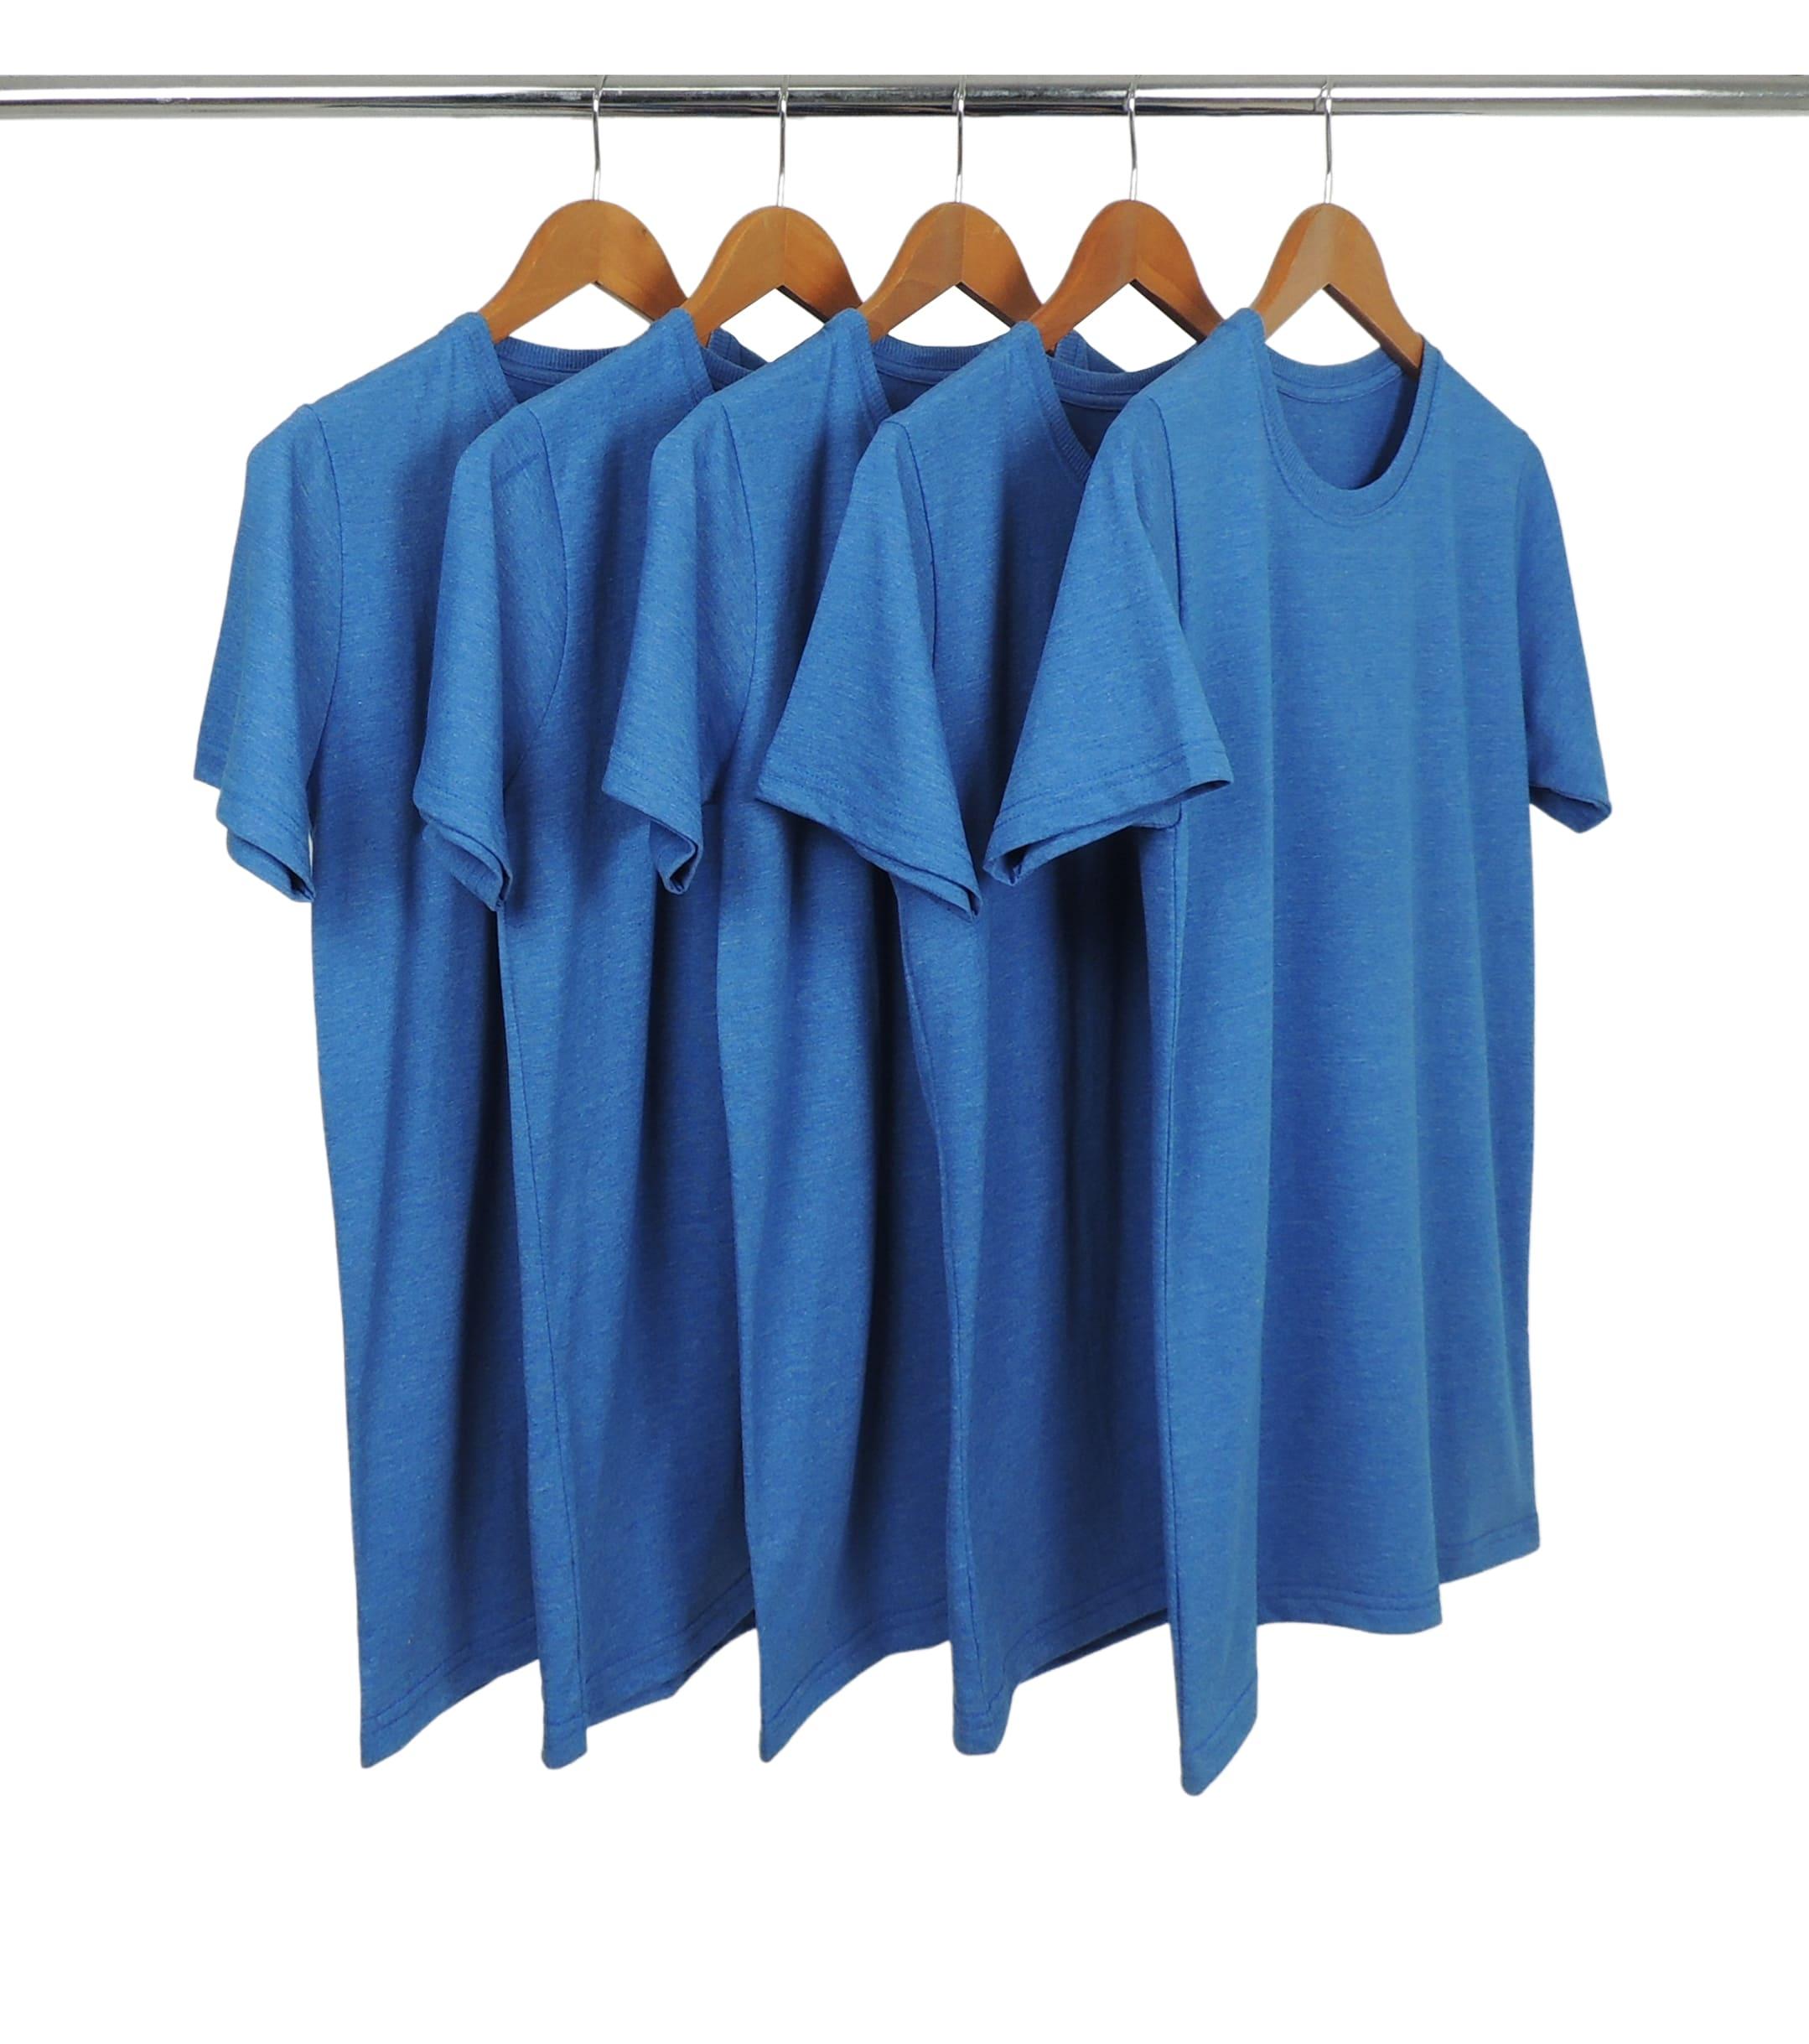 5 PEÇAS - Camiseta Comfort Mescla Azul Royal